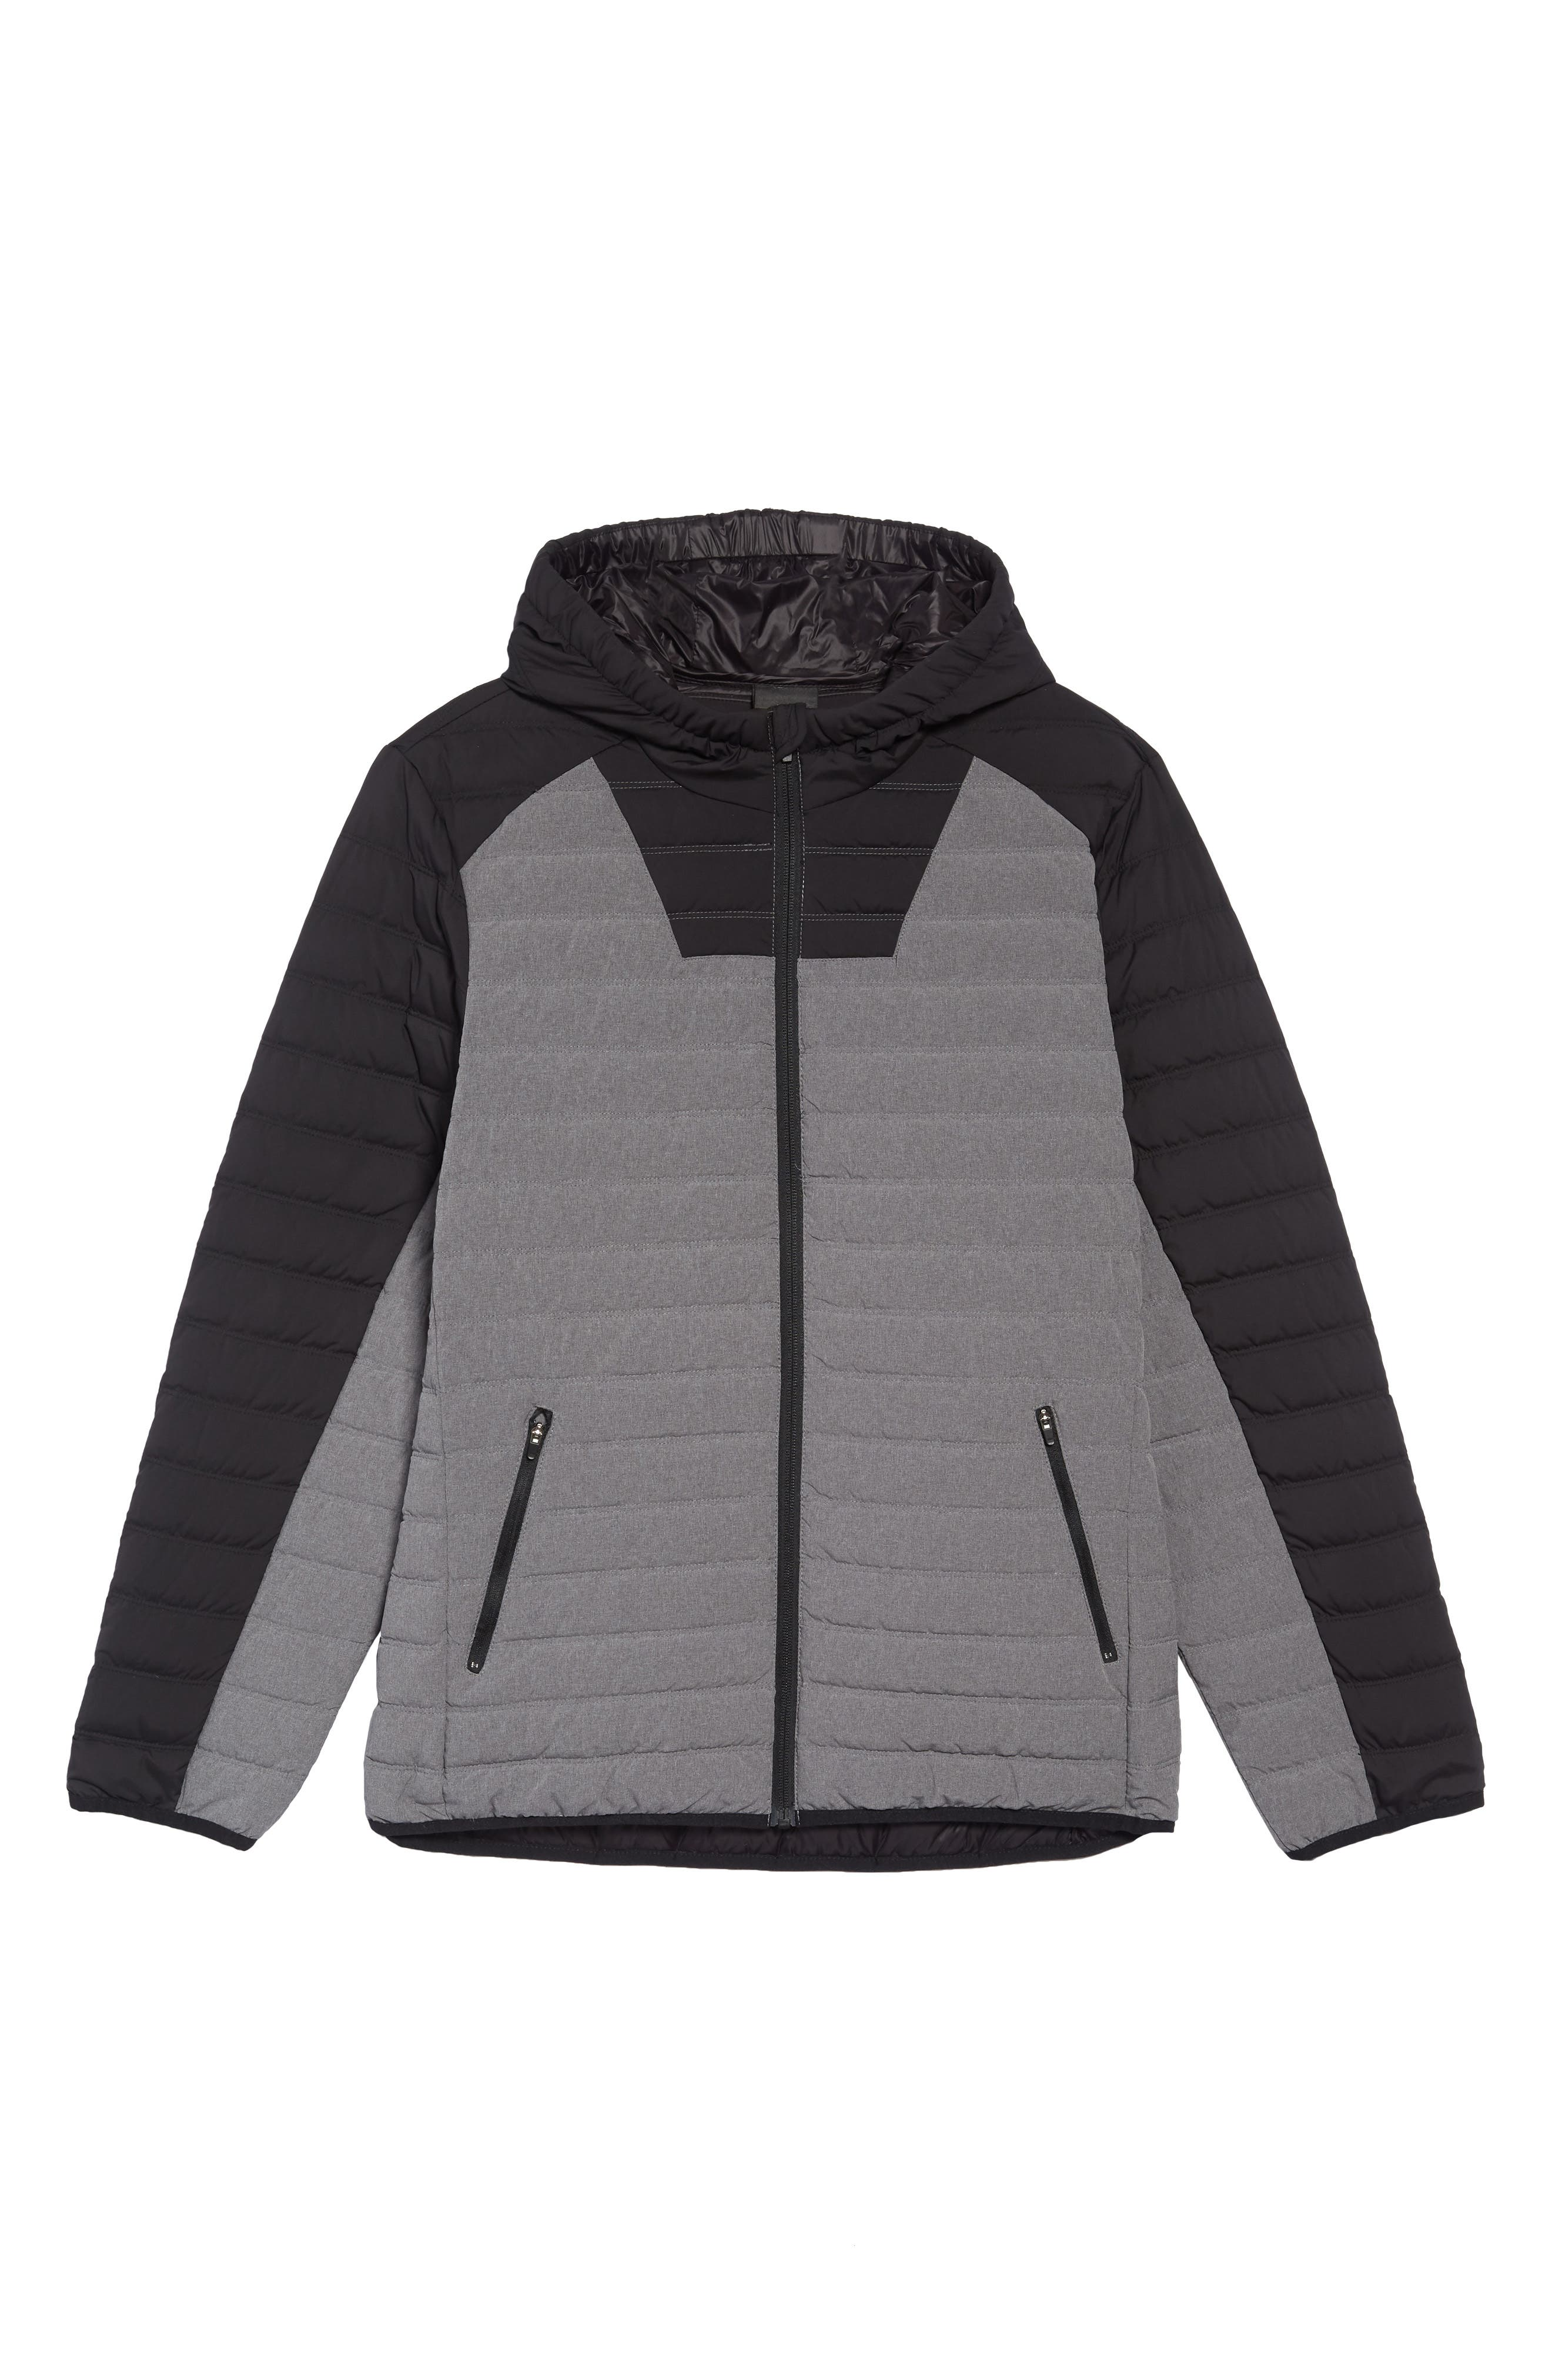 Hooded Water Resistant Down Jacket,                             Alternate thumbnail 5, color,                             BLACK GREY OBSIDIAN